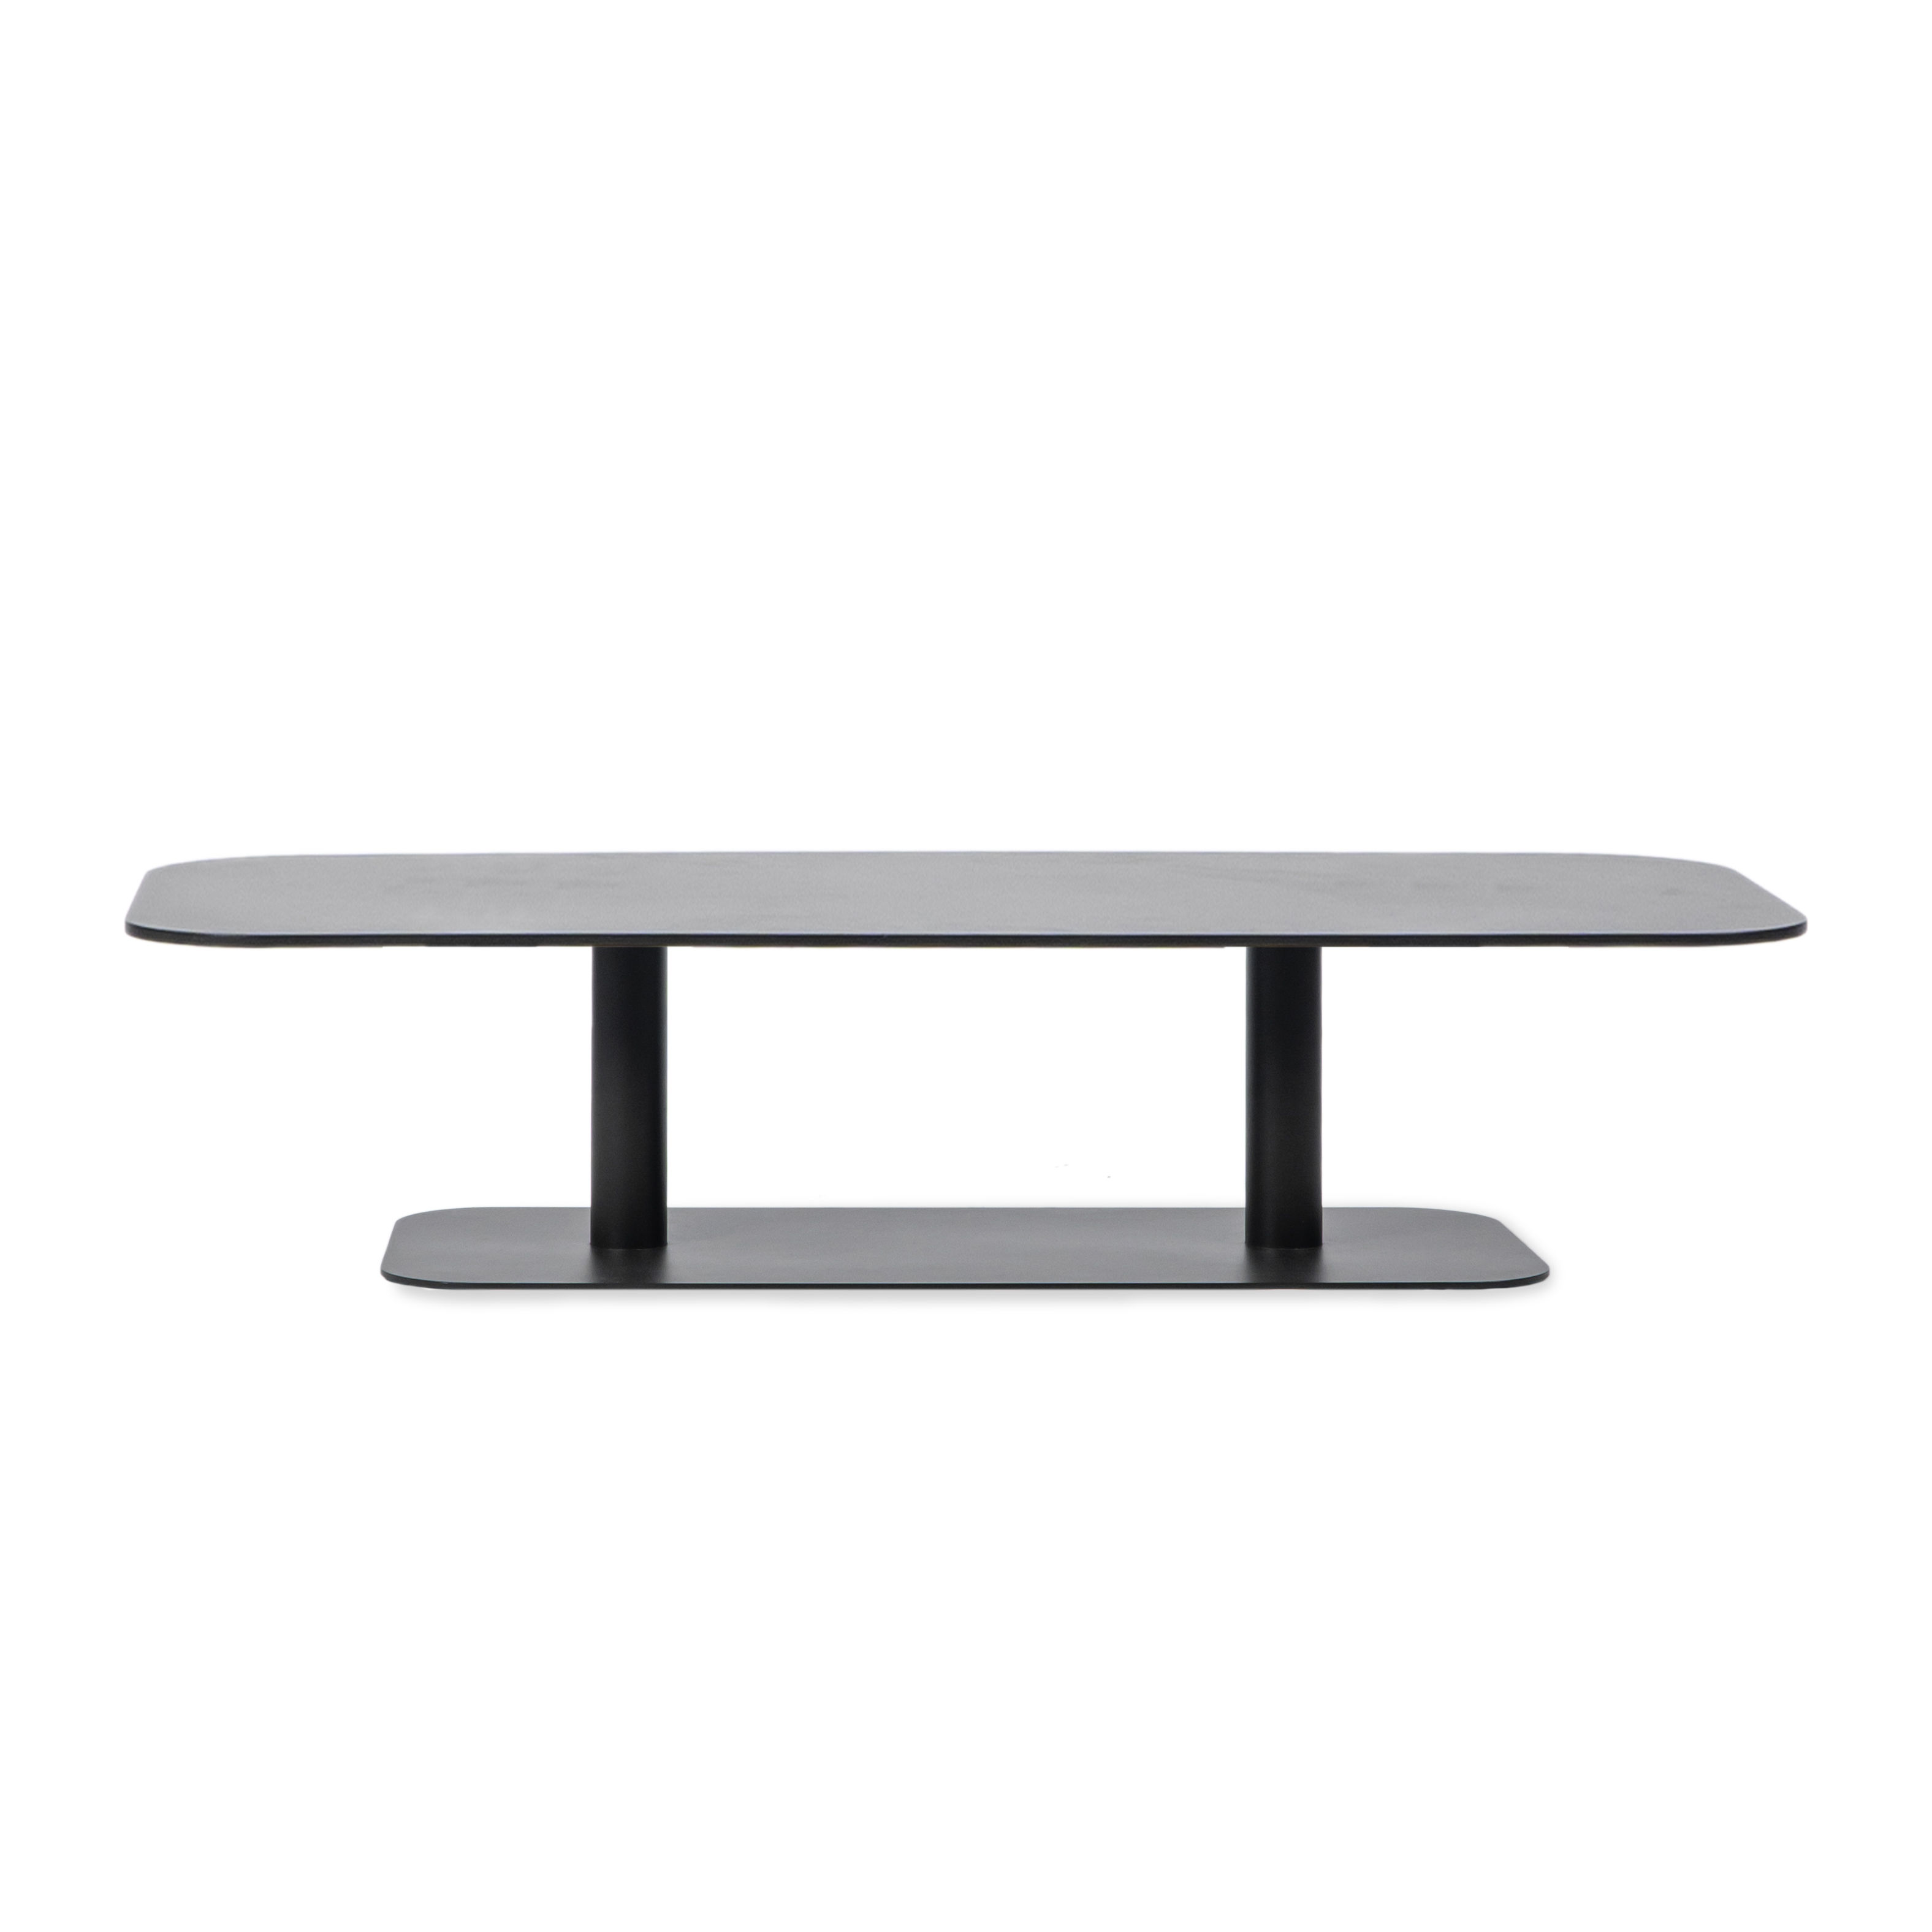 Mobilier - Tables basses - Table basse Kodo / 129 x 45 cm - Aluminium - Vincent Sheppard - Gris Fossile - Aluminium thermolaqué